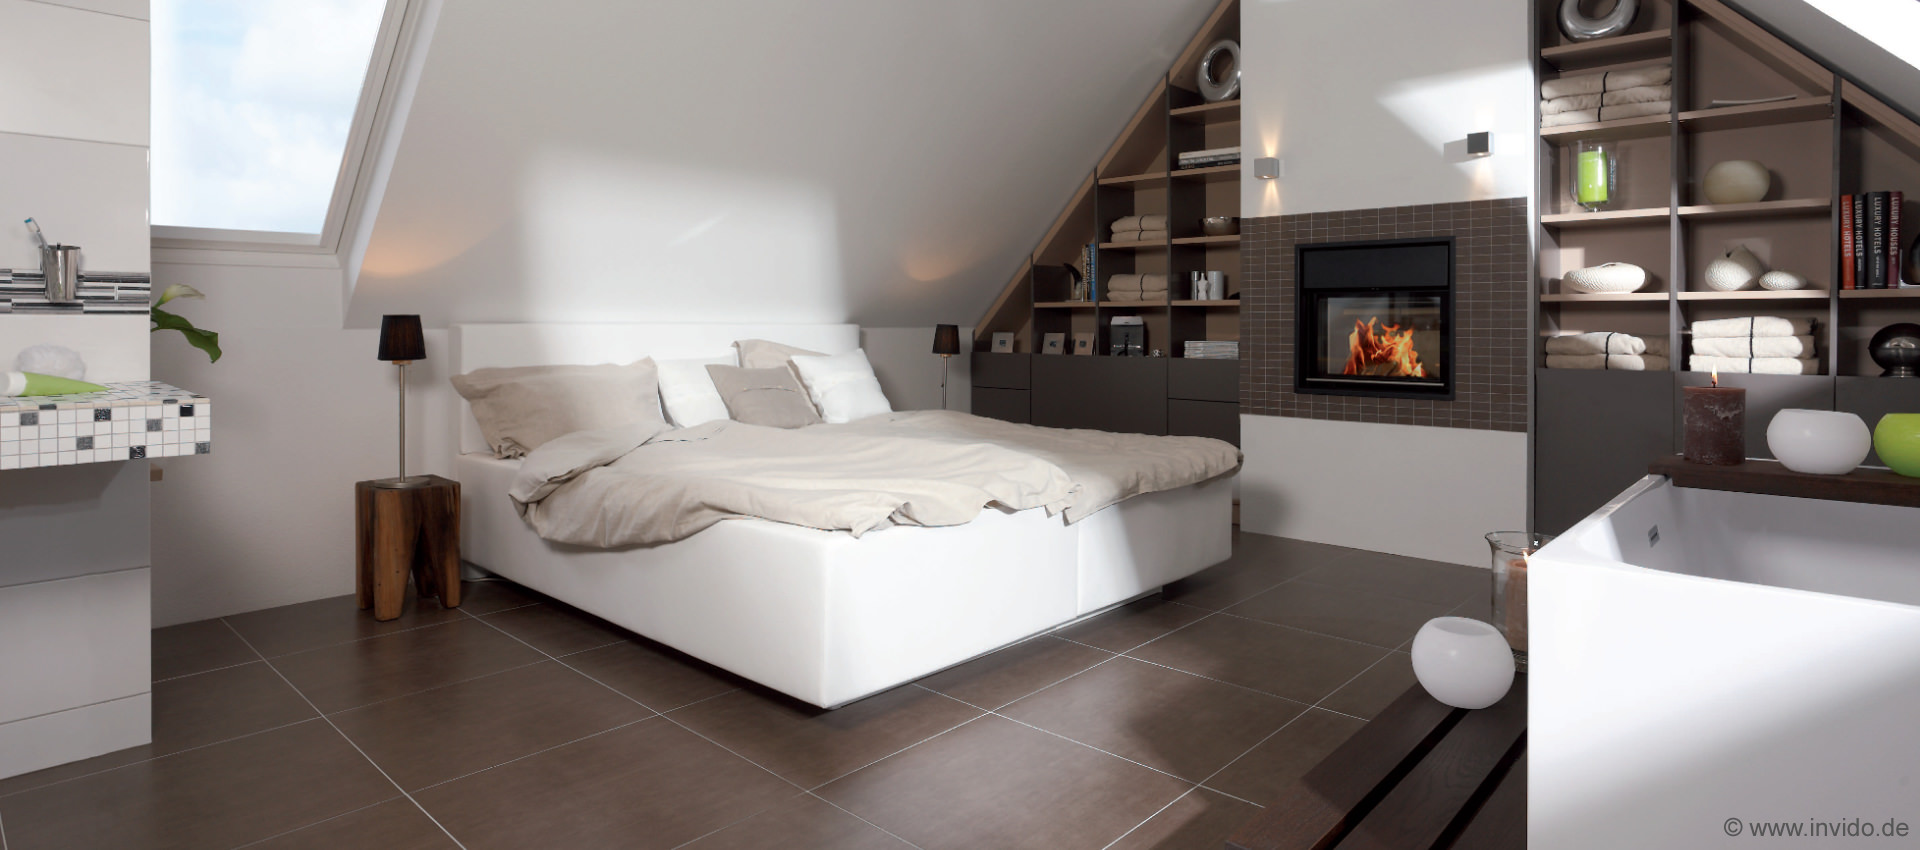 feng shui schlafzimmer kua zahl komplett schlafzimmer schlafzimmer set gro er schrank wohn. Black Bedroom Furniture Sets. Home Design Ideas